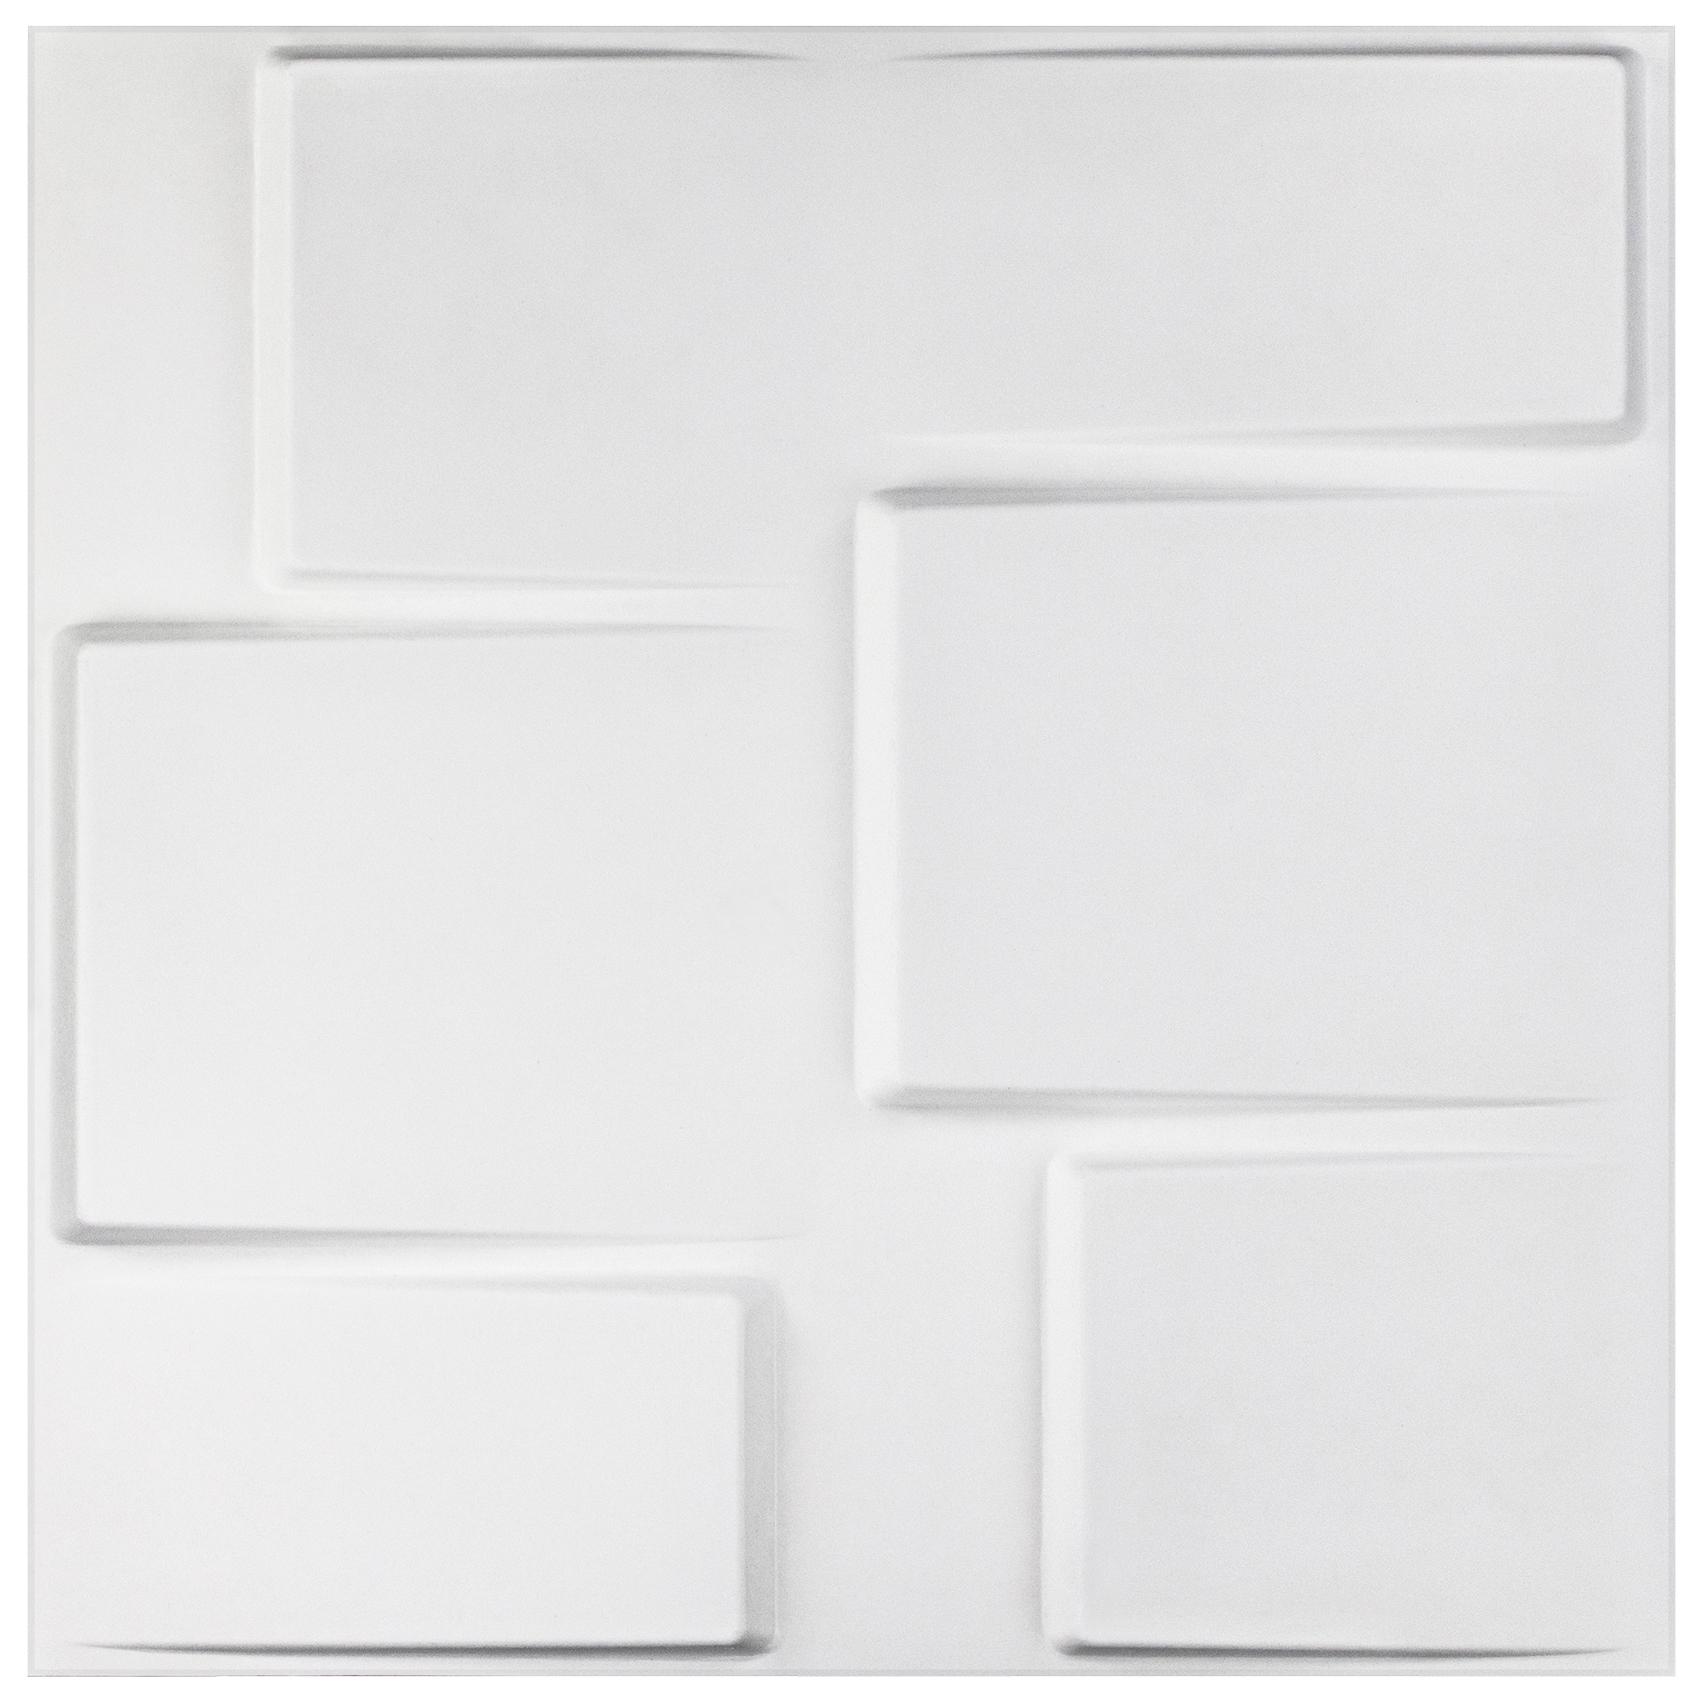 15 qm Paneele 3D Platten Wandpaneele 3D Wandplatten Wand Decke 50x50cm Carlos